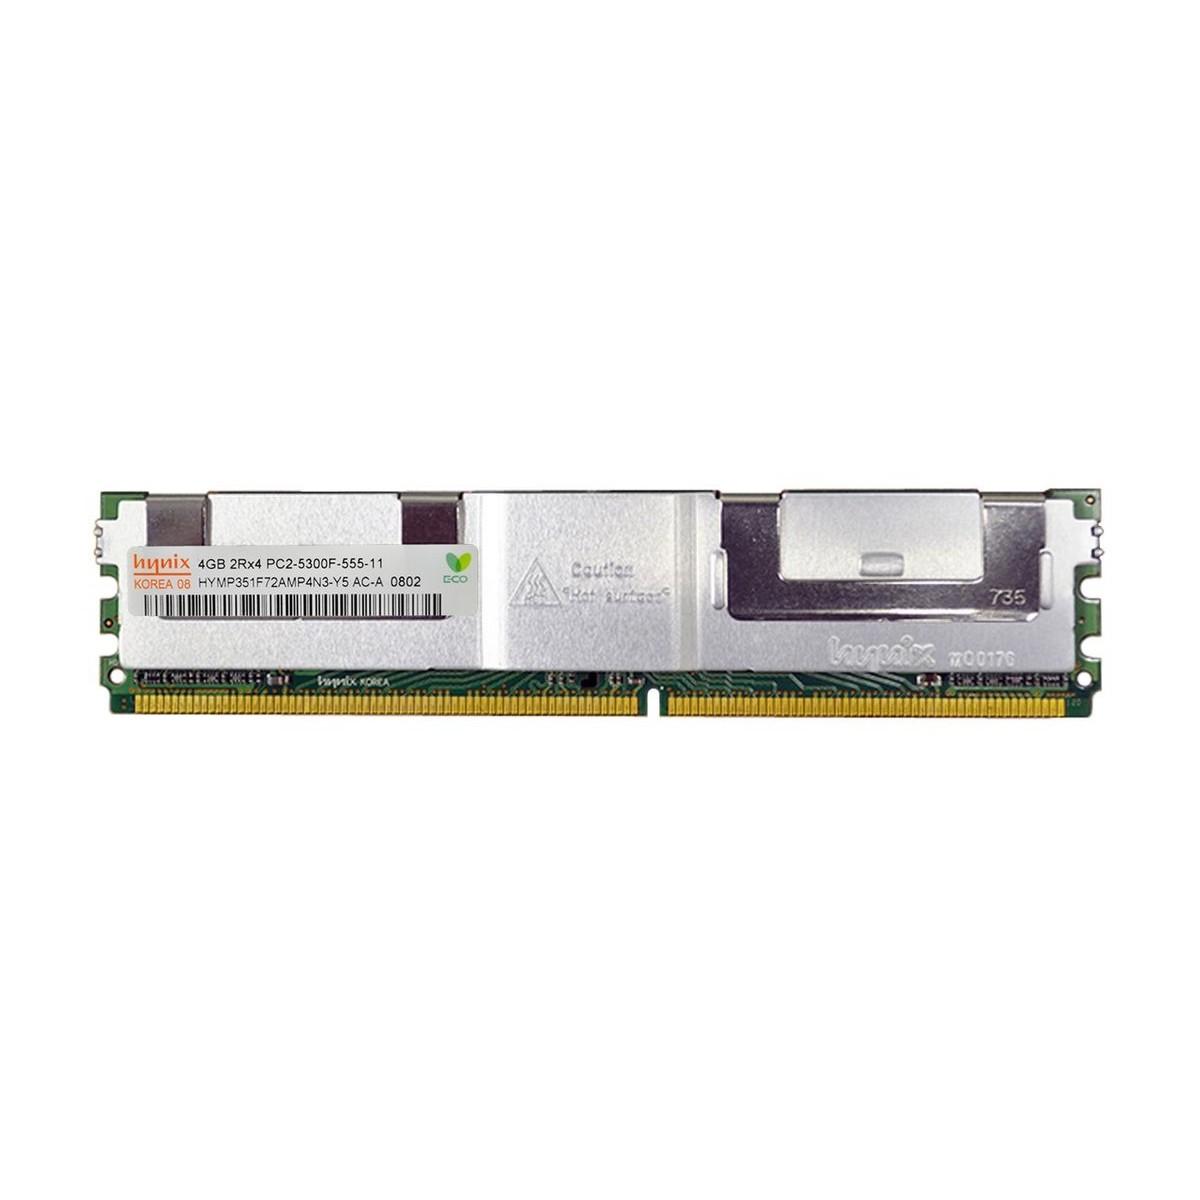 WIN2012 R2 15CAL+DELL T410 2.4 SIX 16GB 3xSAS 6i